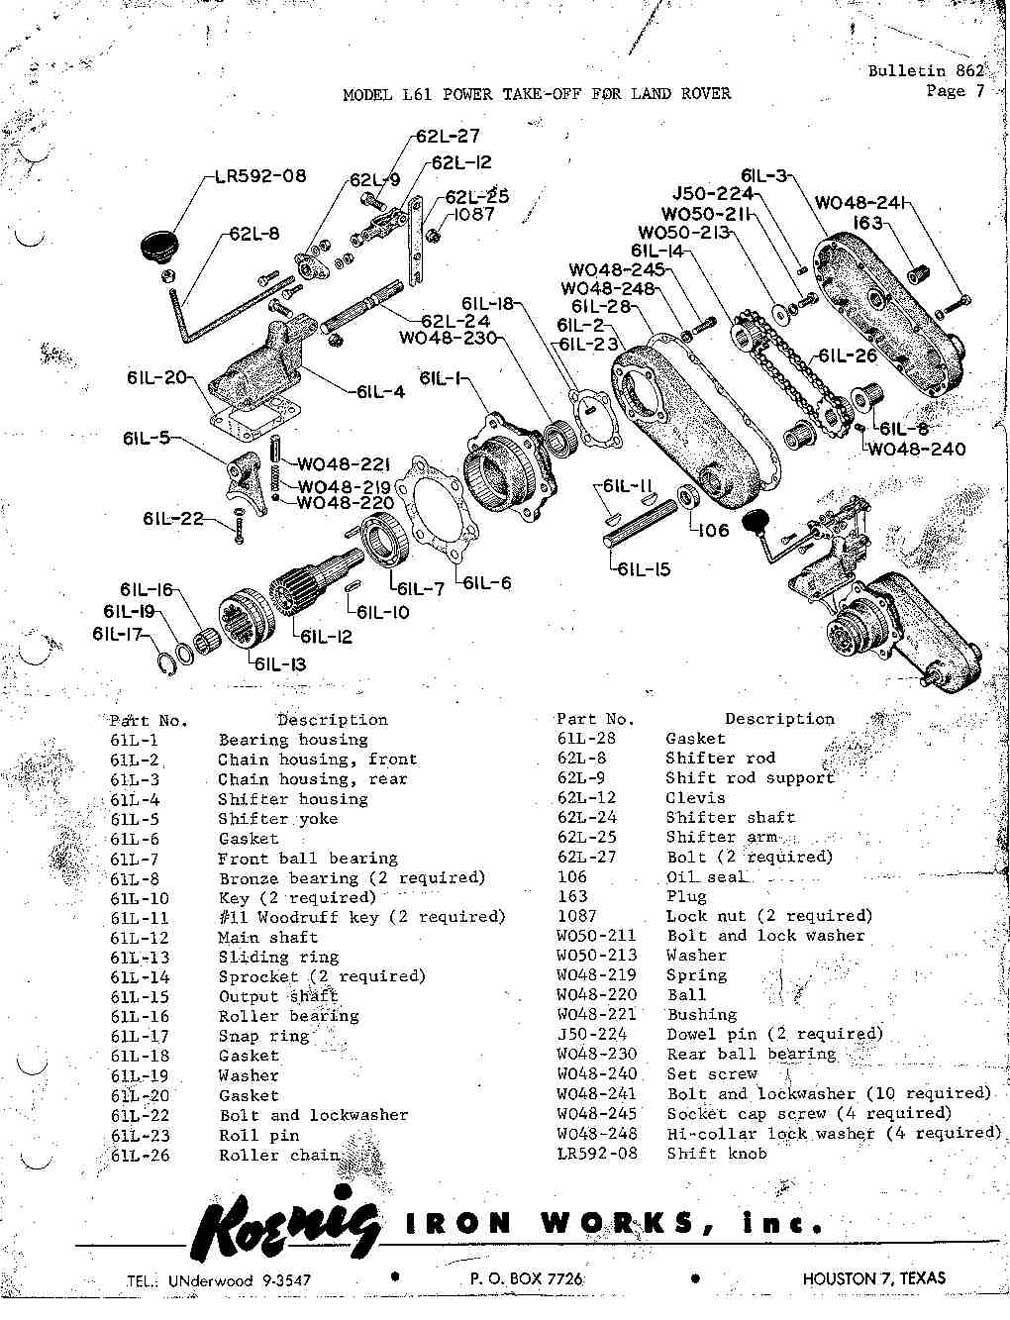 Land rover faq koenig winches series ii iia vehicles originally page 7 large